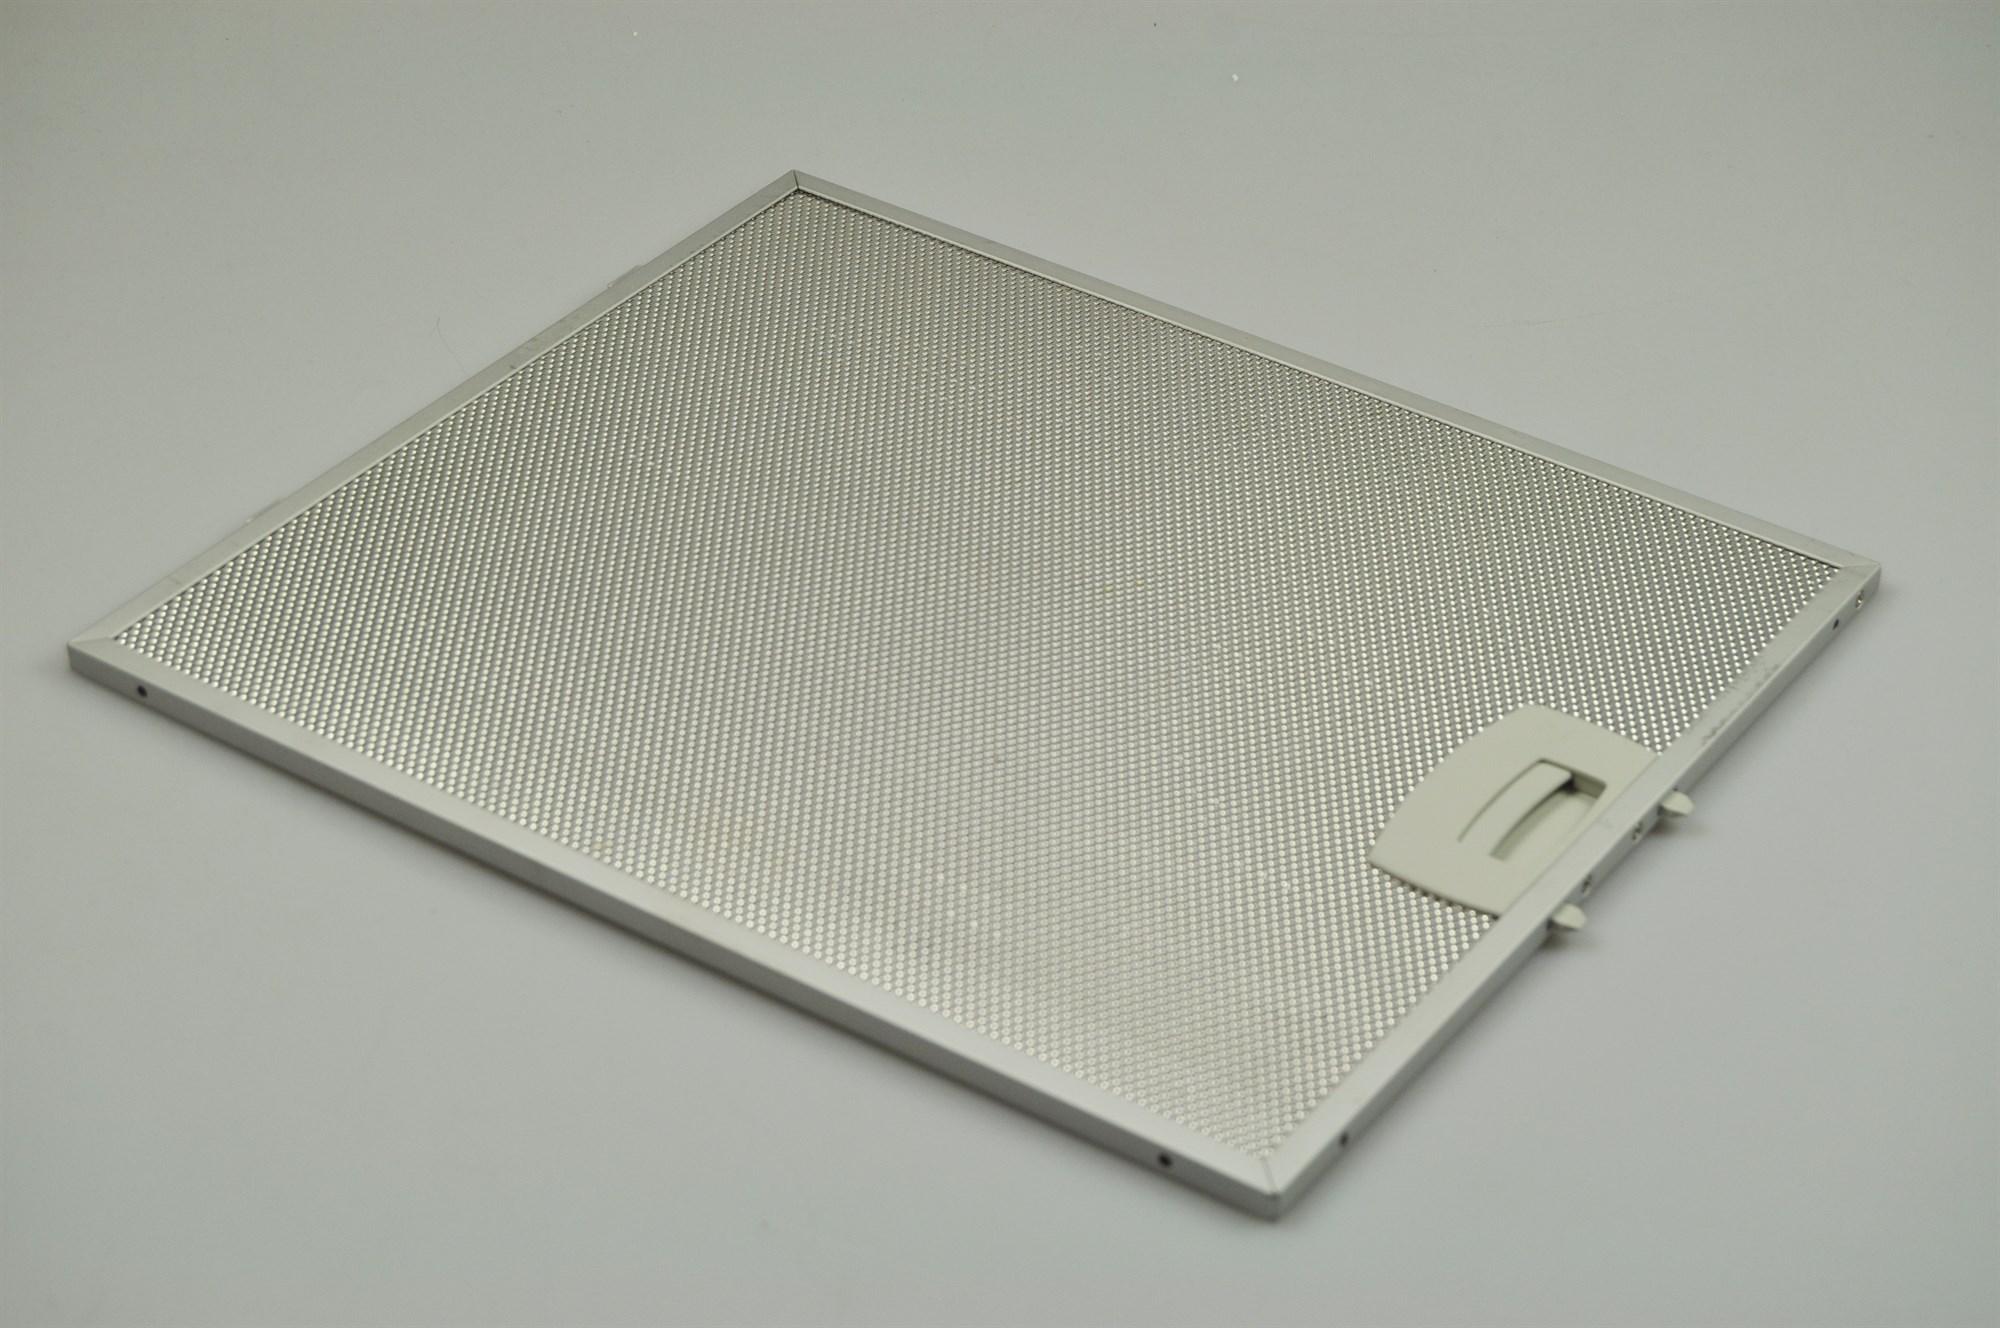 Dunstabzugshaube Viva Filter : Metallfilter silverline dunstabzugshaube aluminium